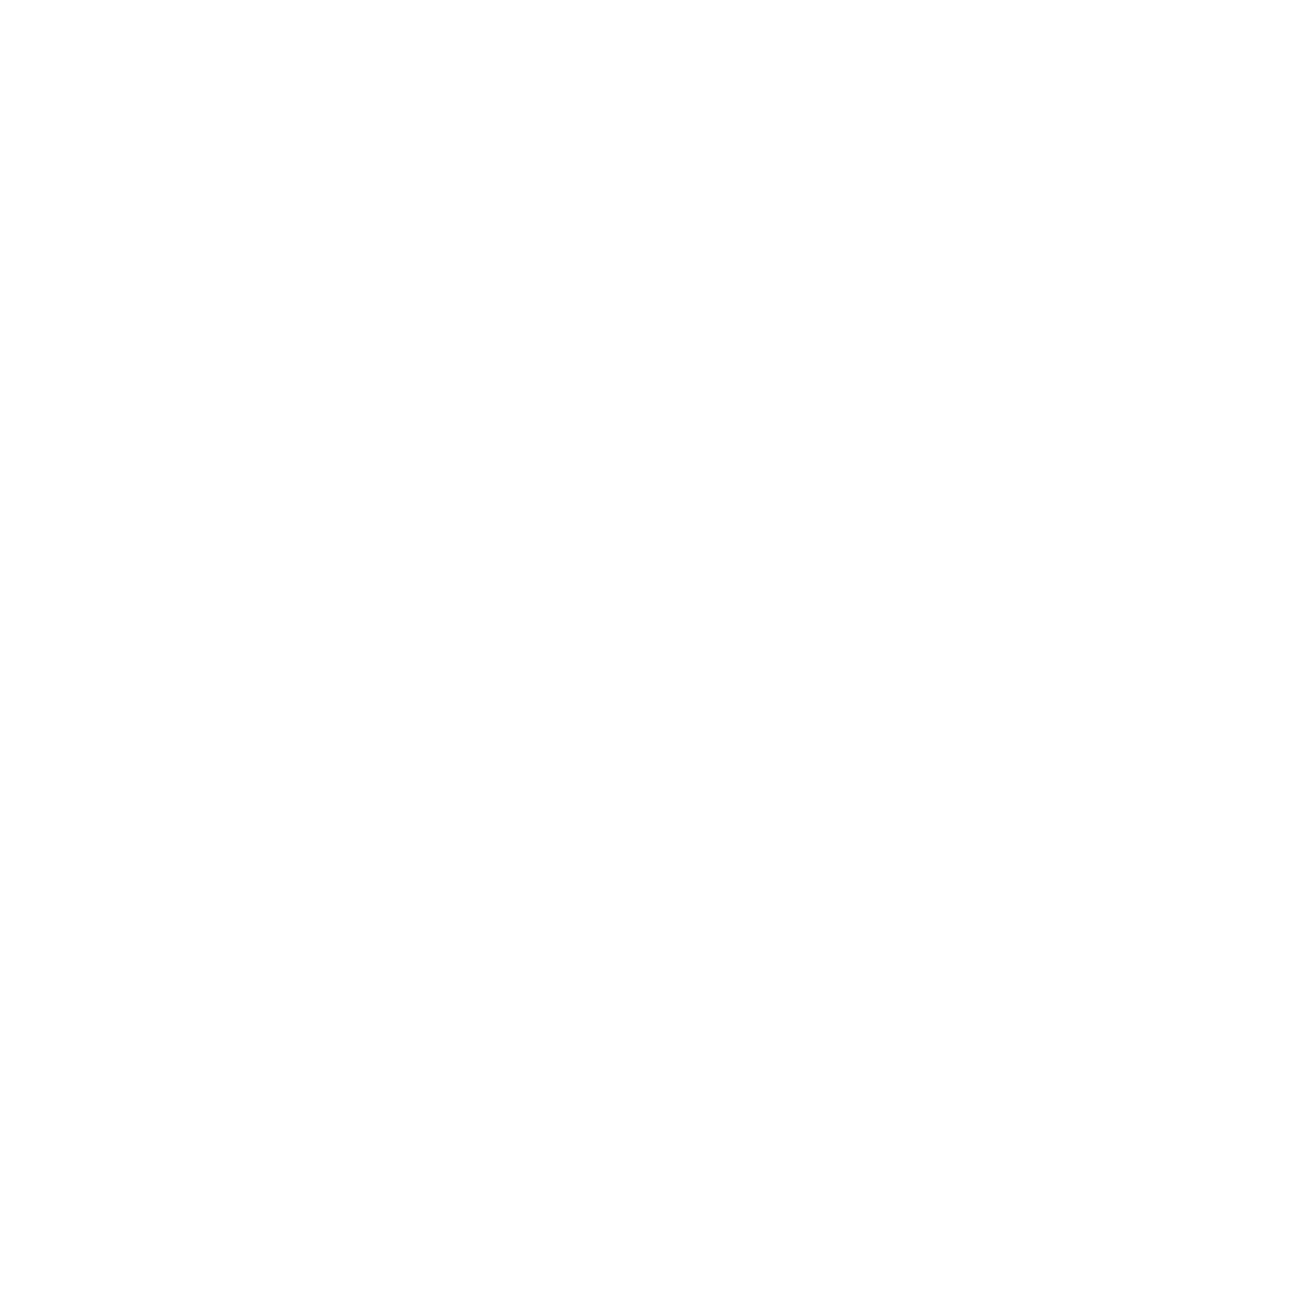 NUREL Engineering Polymers Hydrolysis Resistance Icon